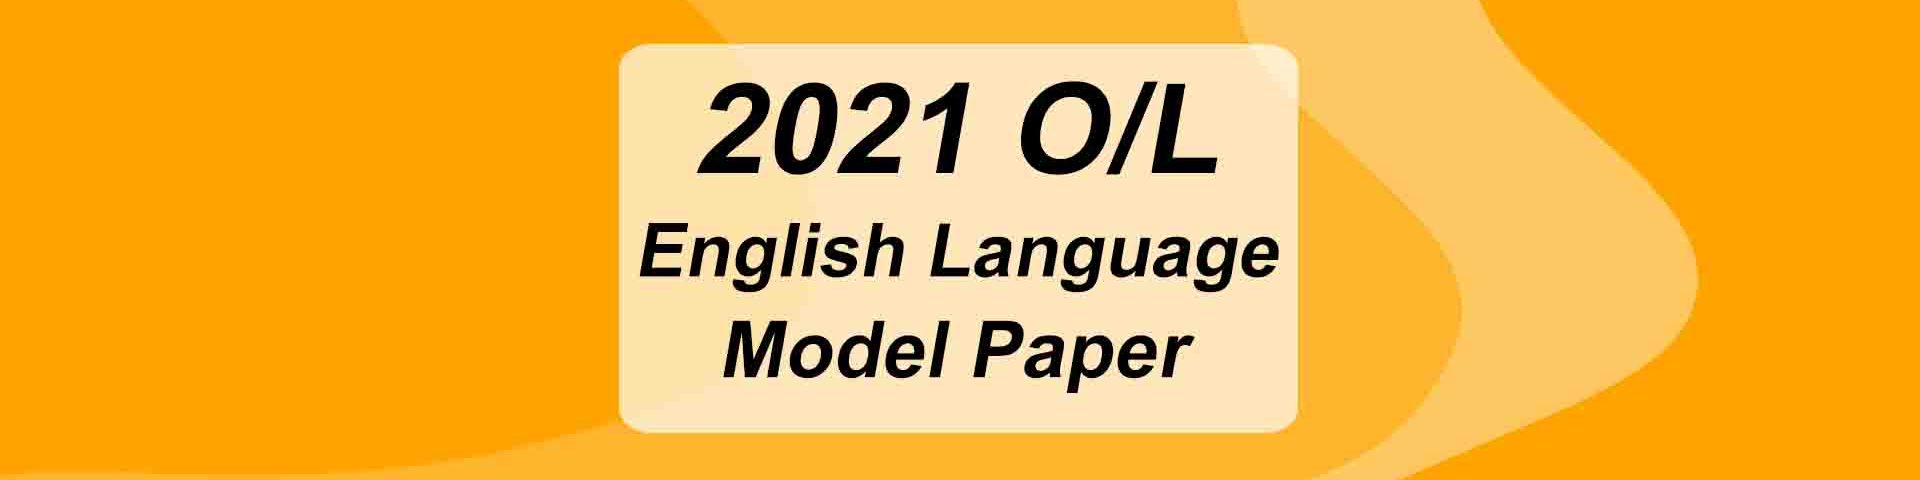 2021 O/L English Model Paper Free Download